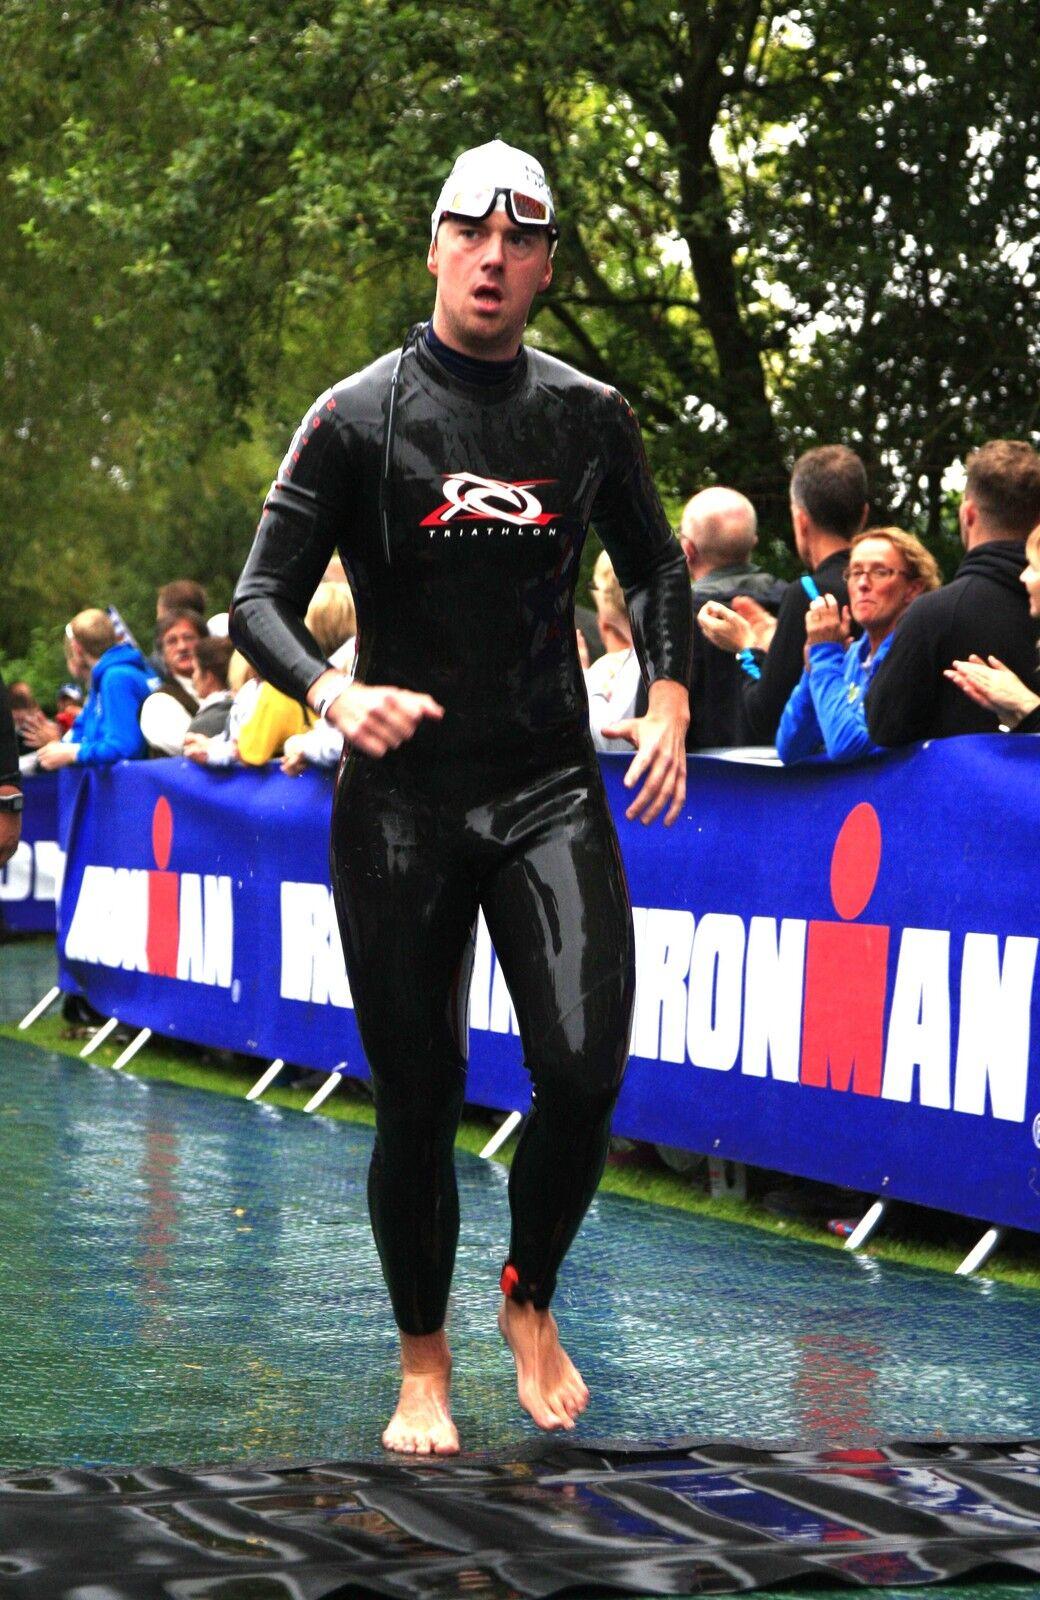 Triathlon Full 3 2mm Super Stretch Smooth Skin Neoprene Wetsuit. Ideal 4 Ironman